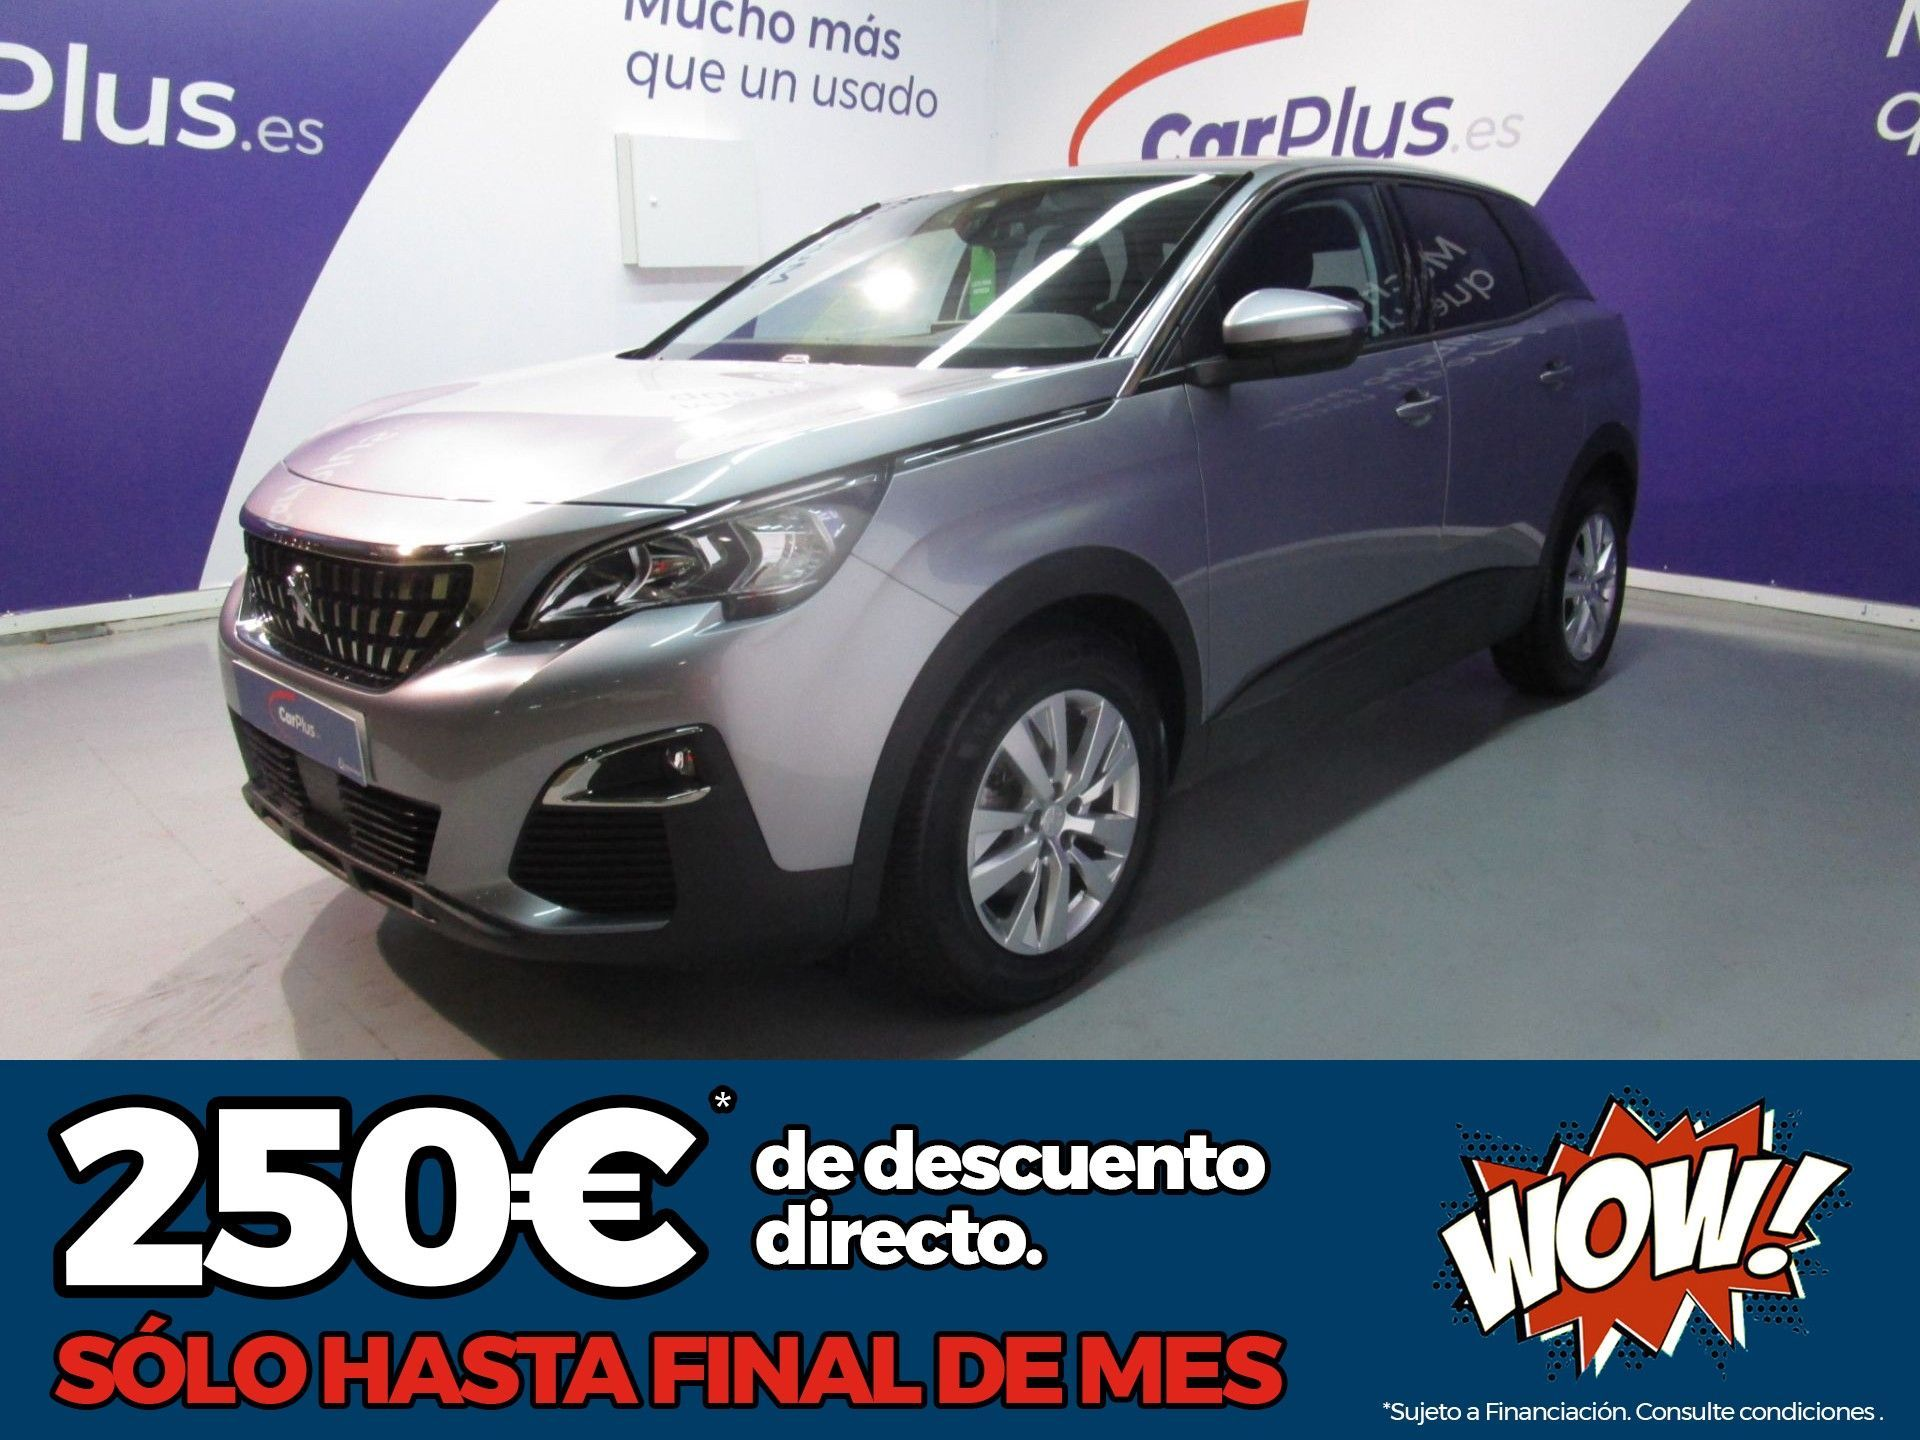 Peugeot 3008 ocasión segunda mano 2020 Diésel por 24.690€ en Madrid